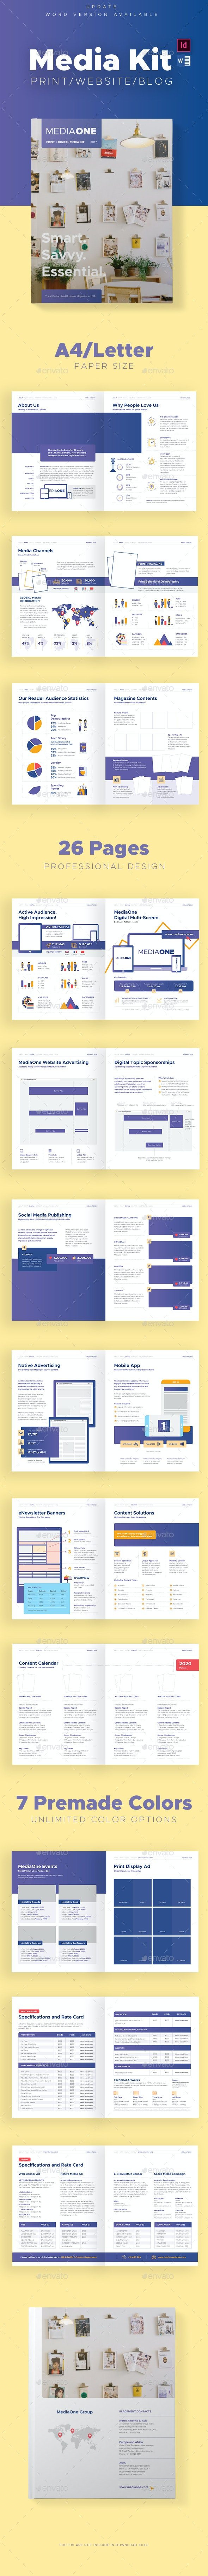 Print and Digital Media Kit Template - Stationery Print Templates